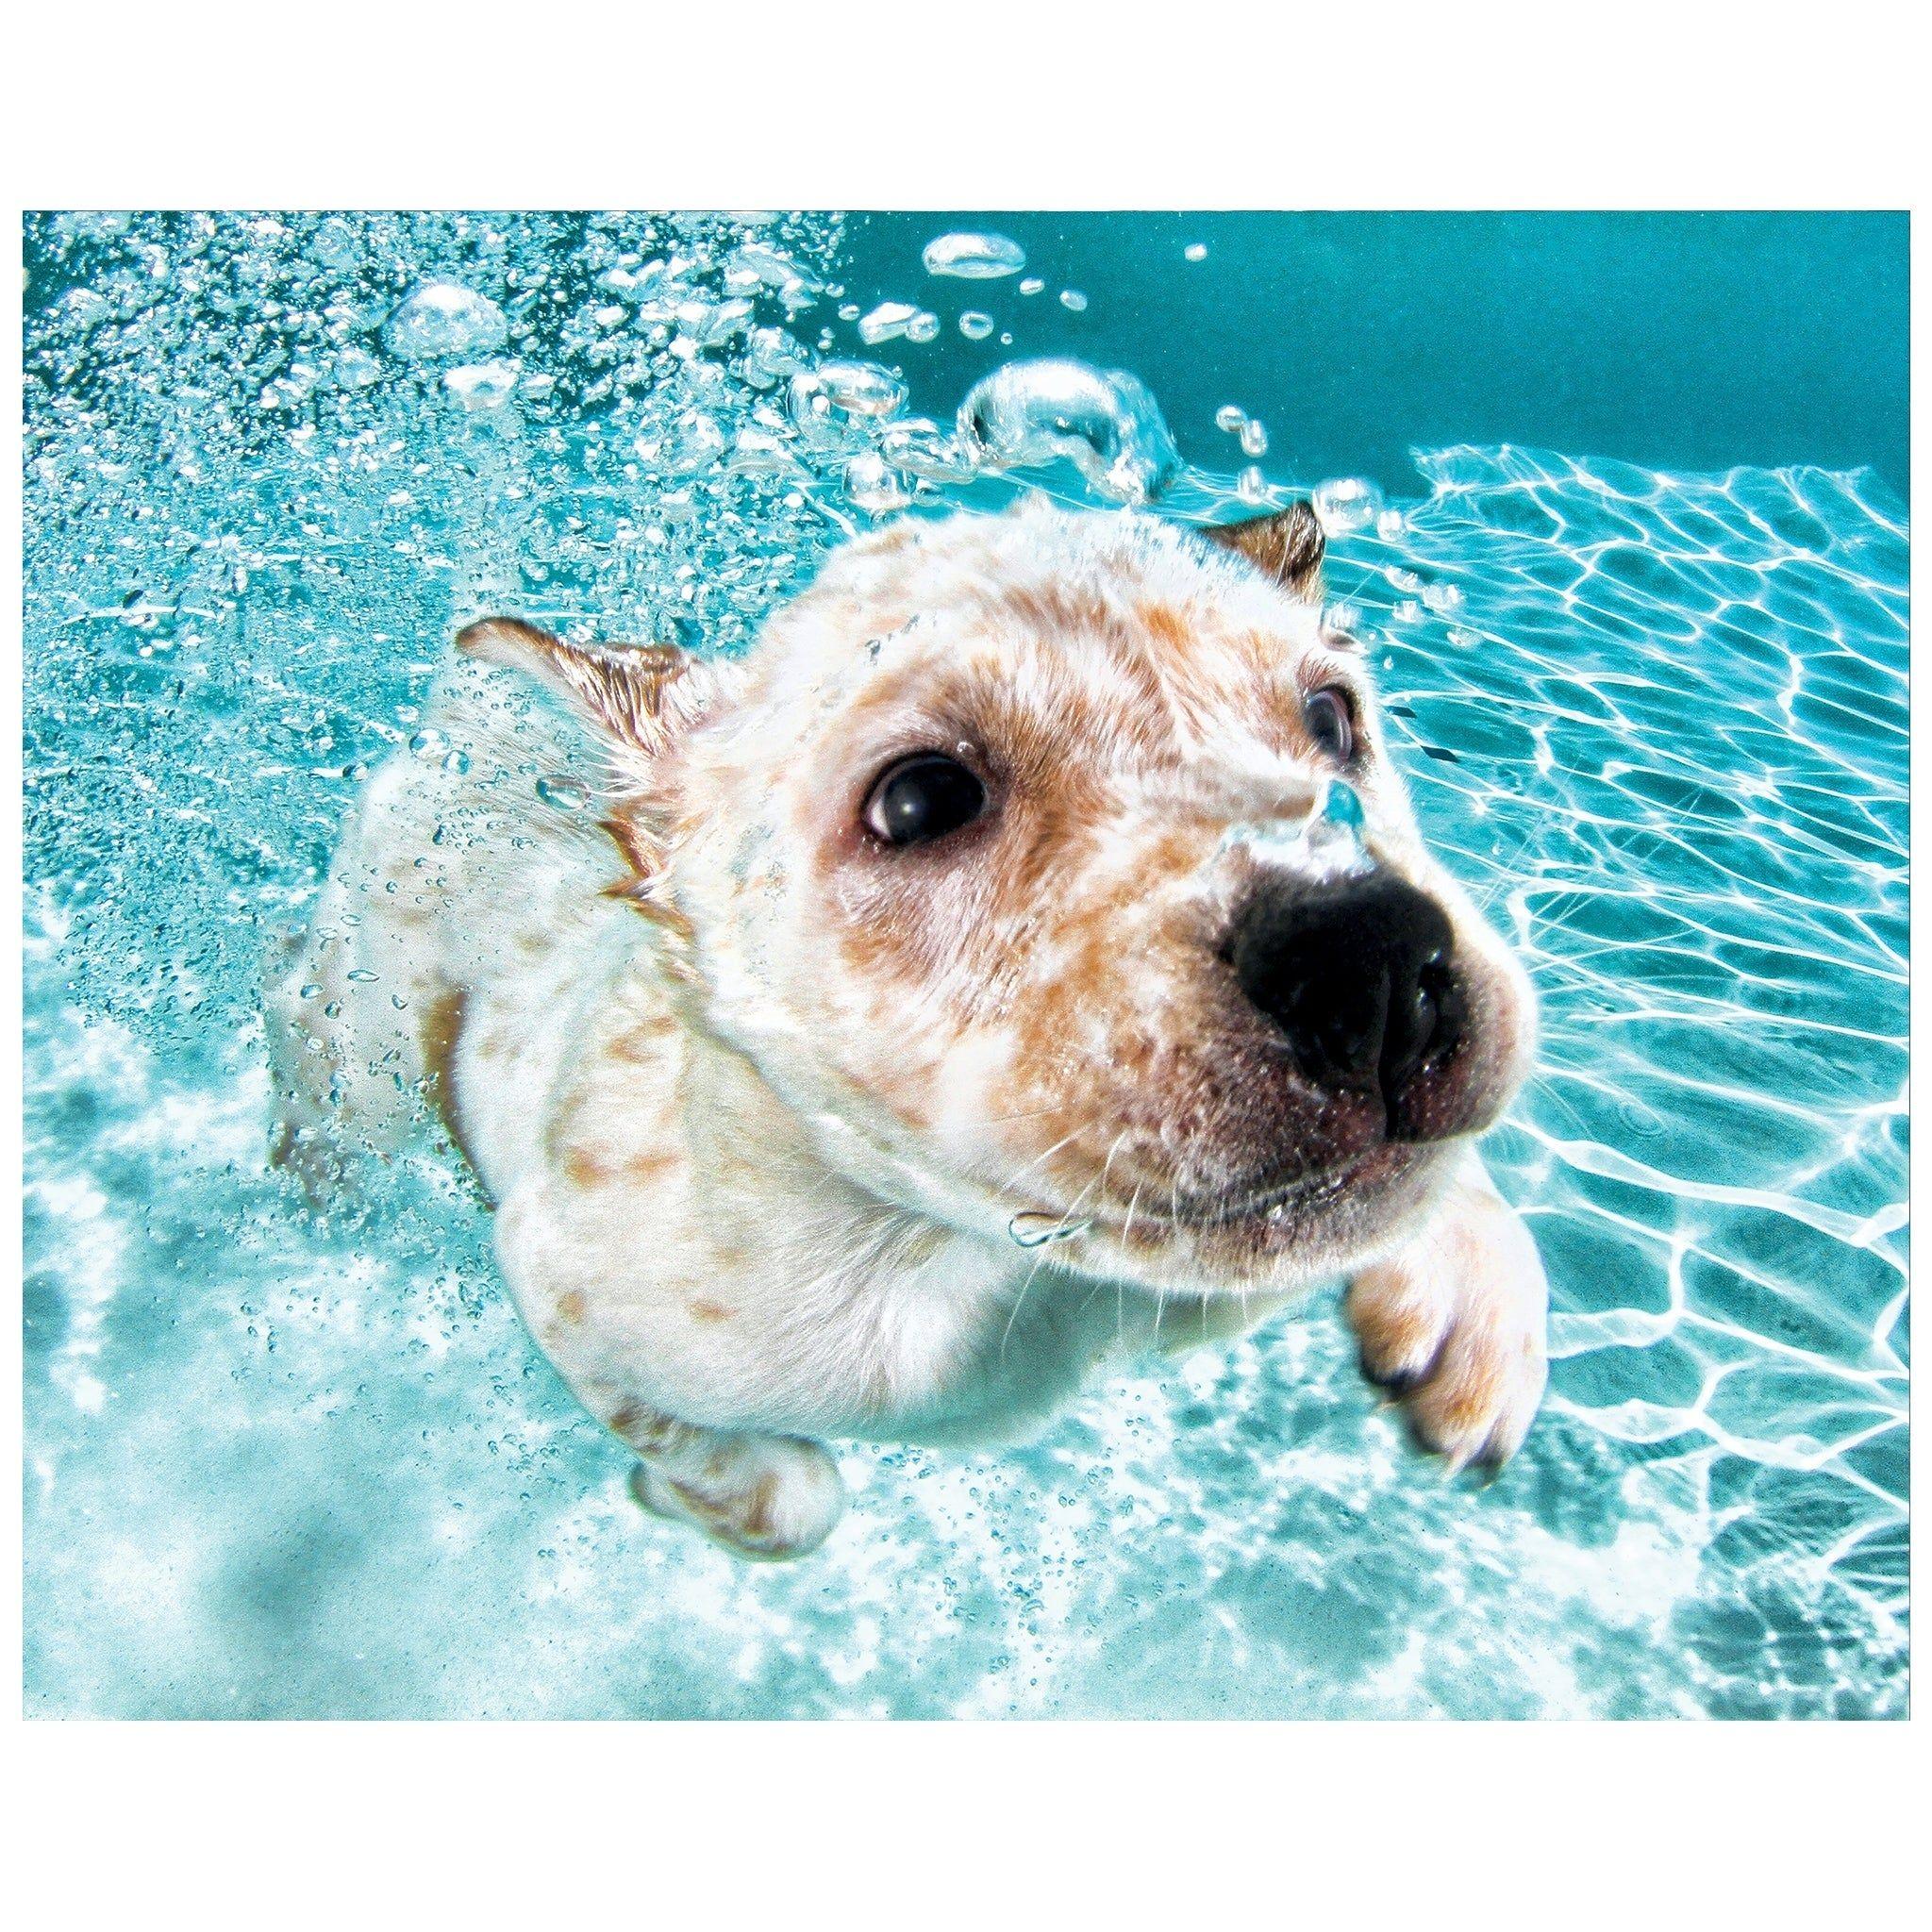 Labrador Retriever Dog Wall Art Unframed Free Floating Tempered